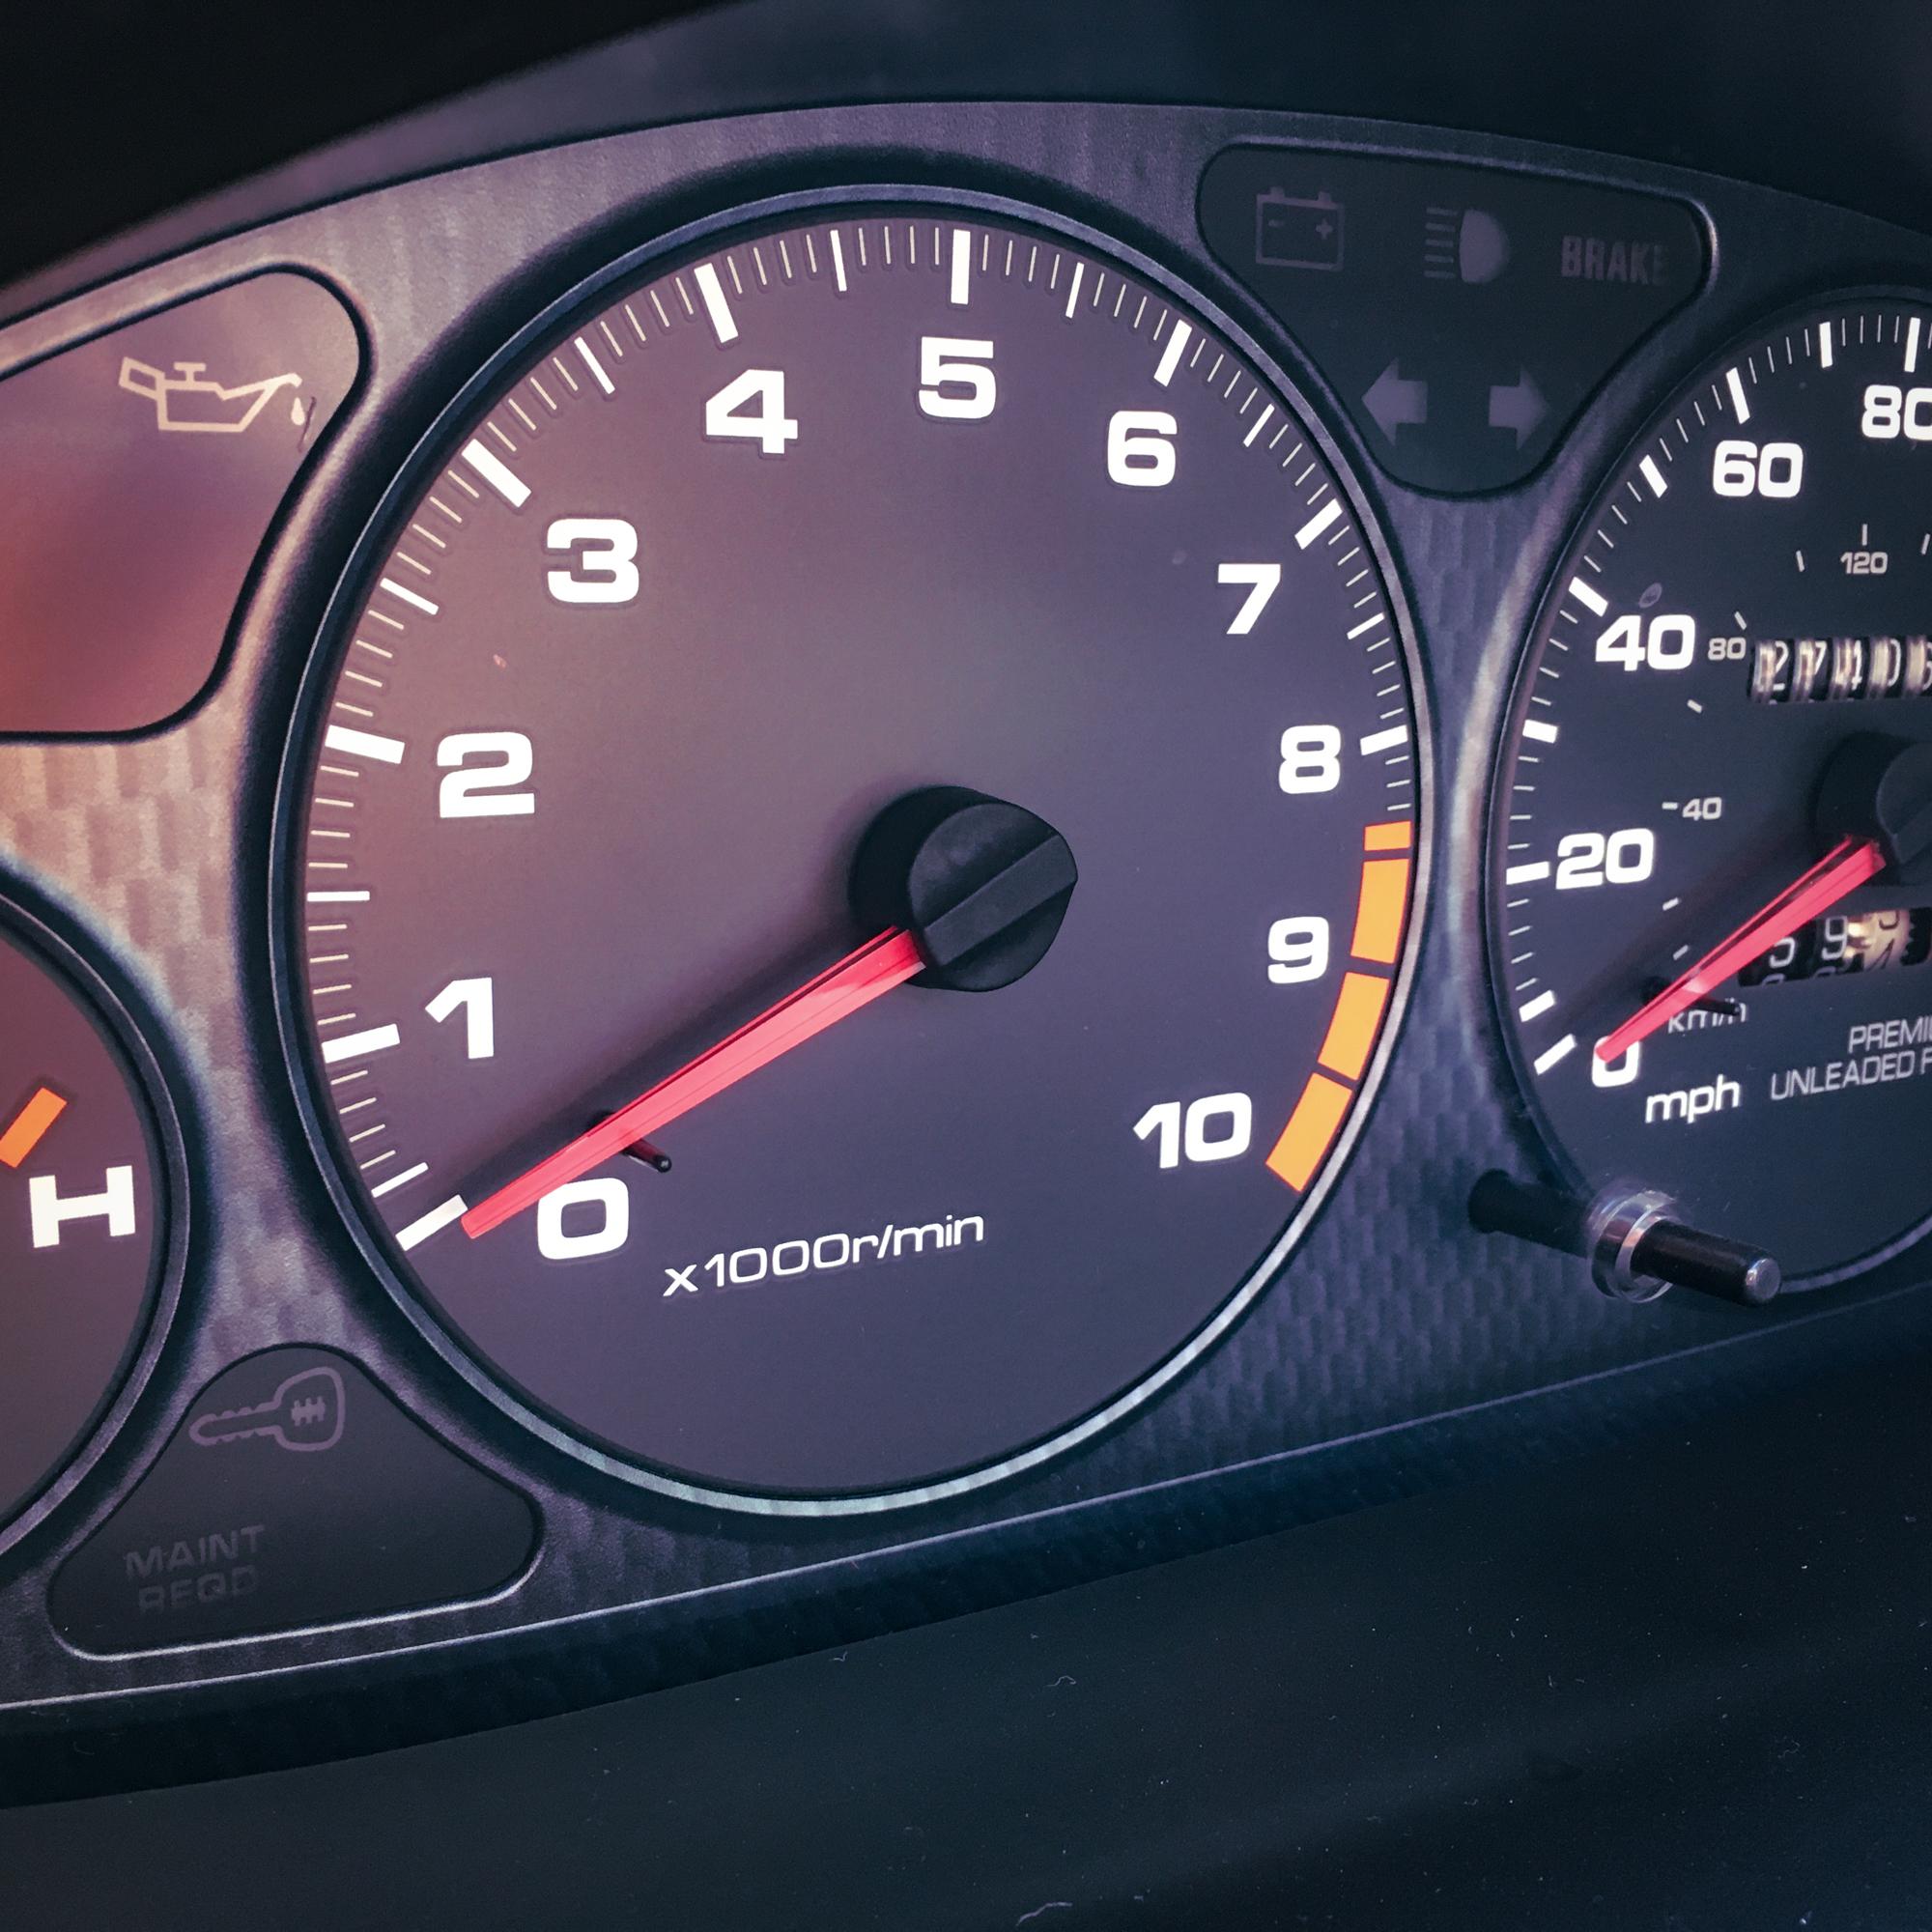 Acura Integra Type R speedometer